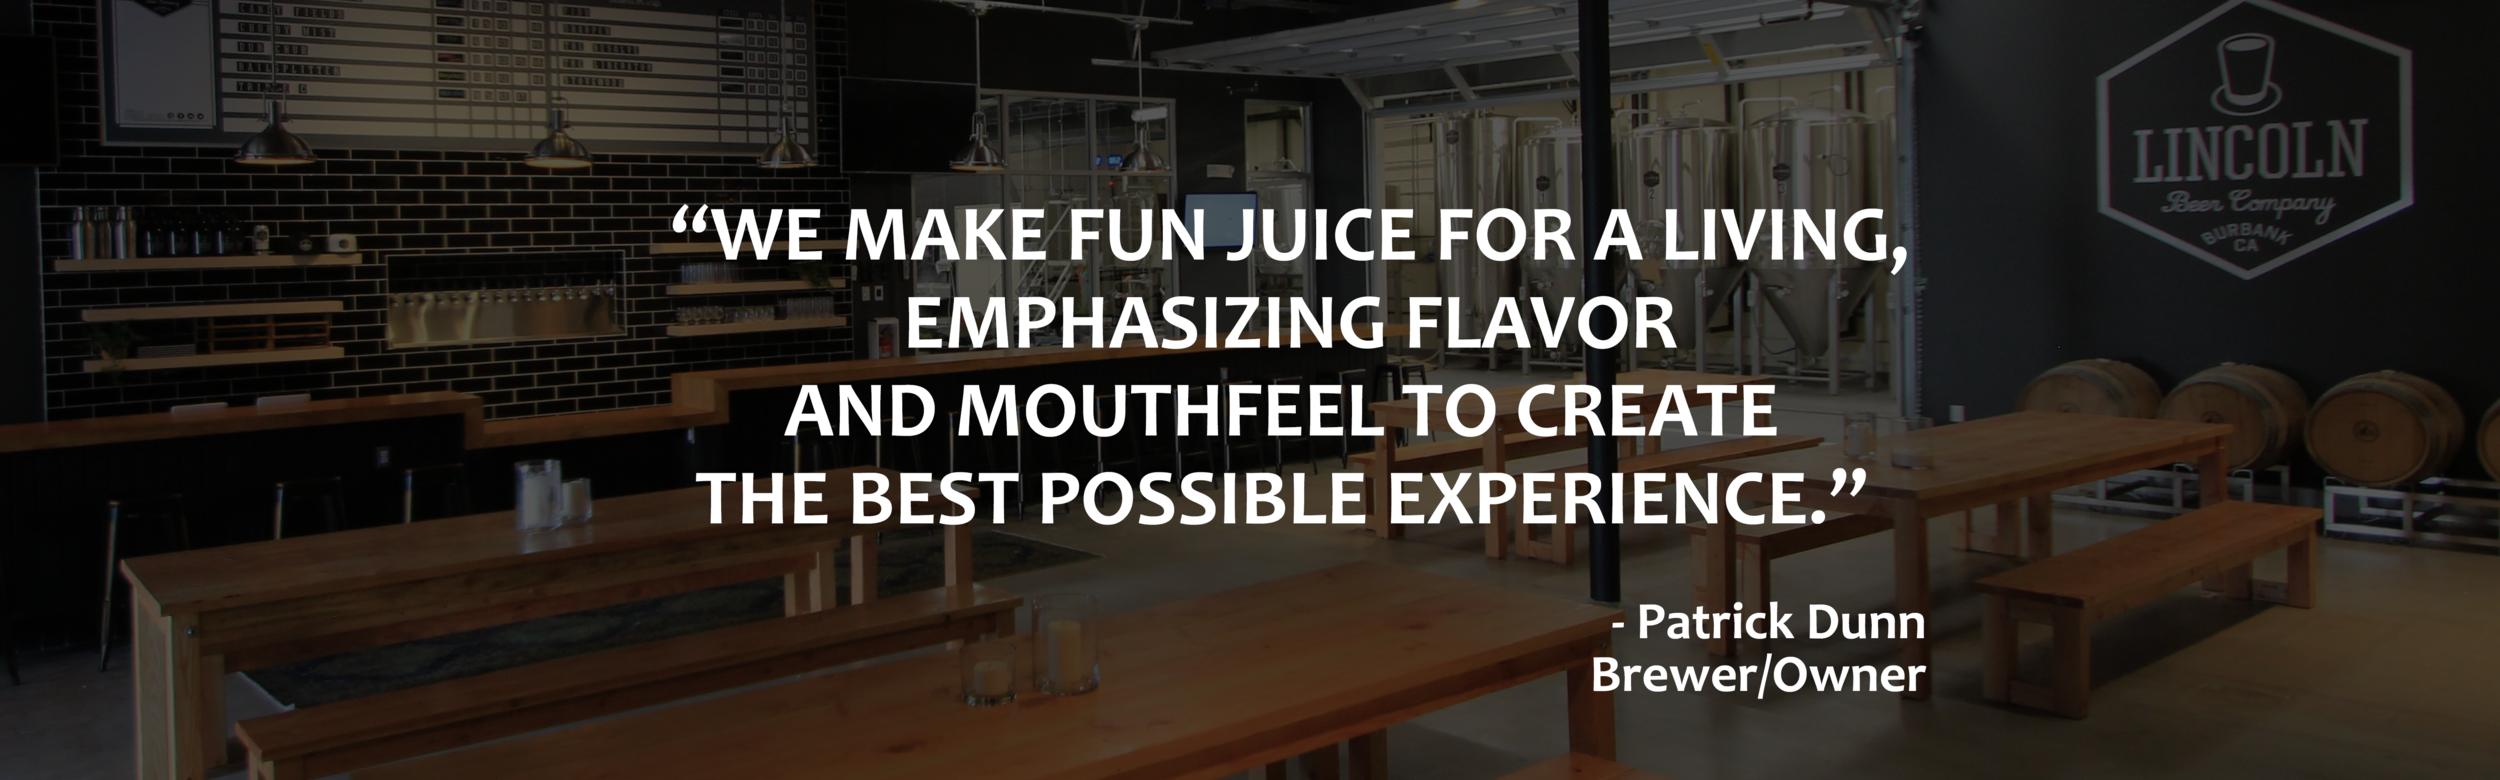 we make fun juice website banner.png